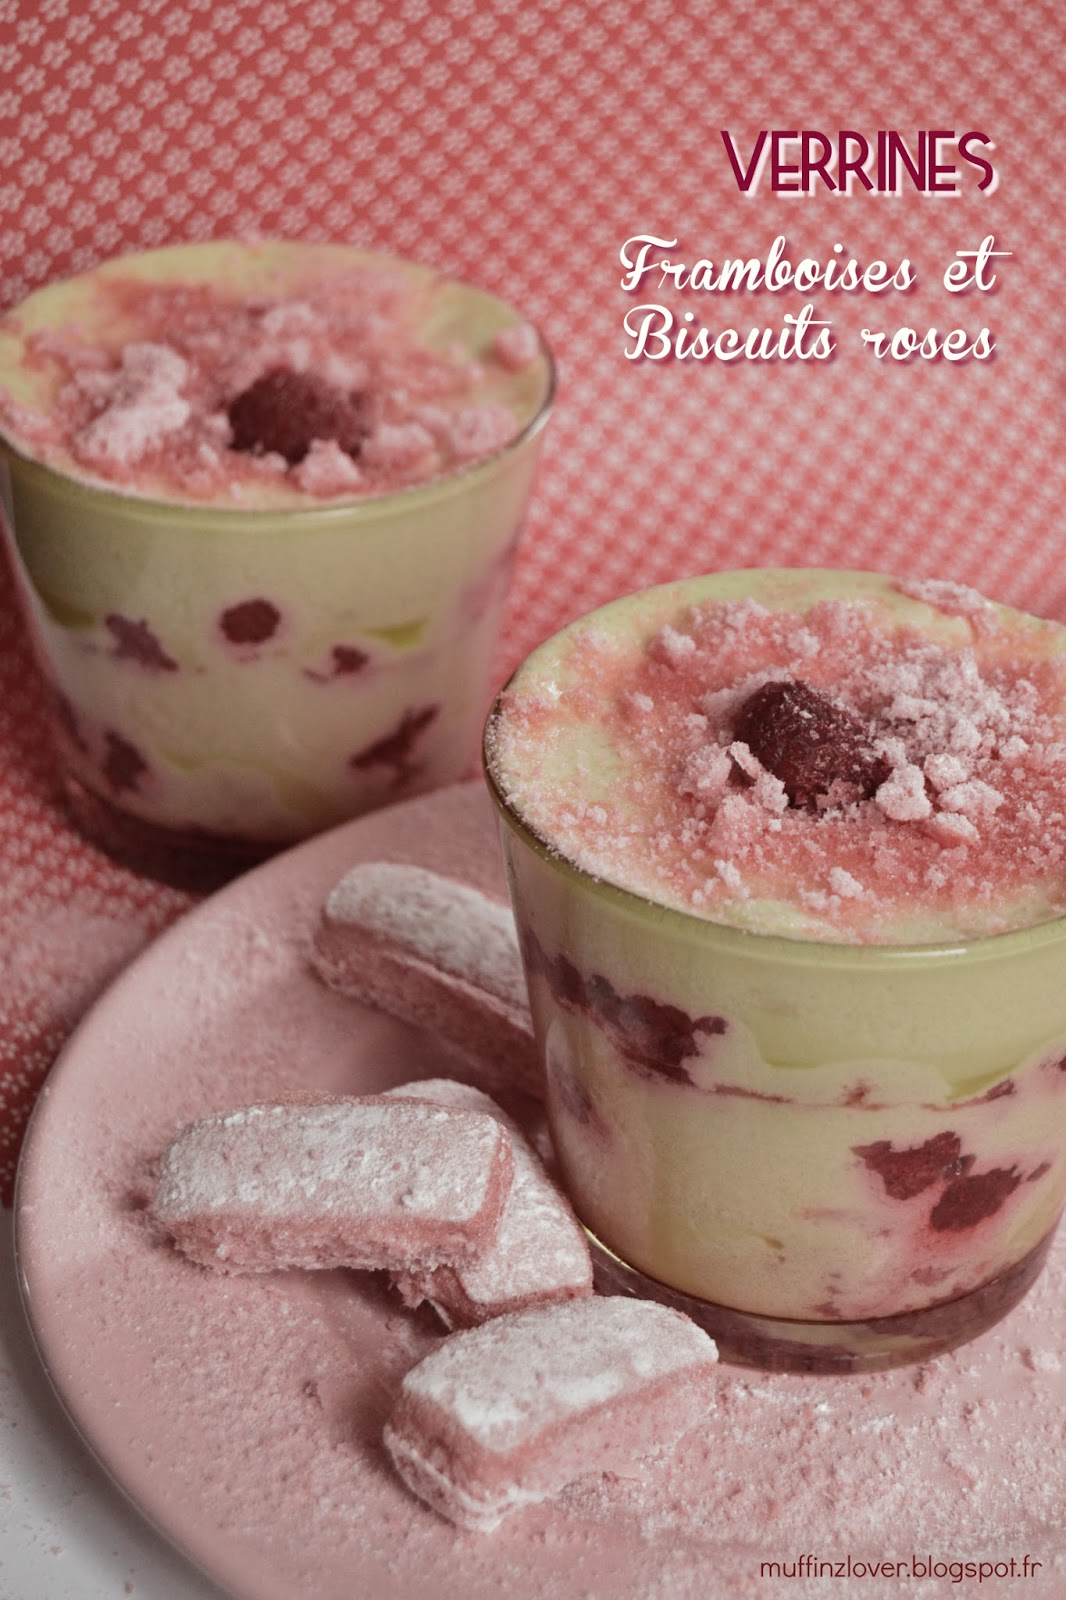 Recette verrines framboises et biscuits roses - muffinzlover.blogspot.fr